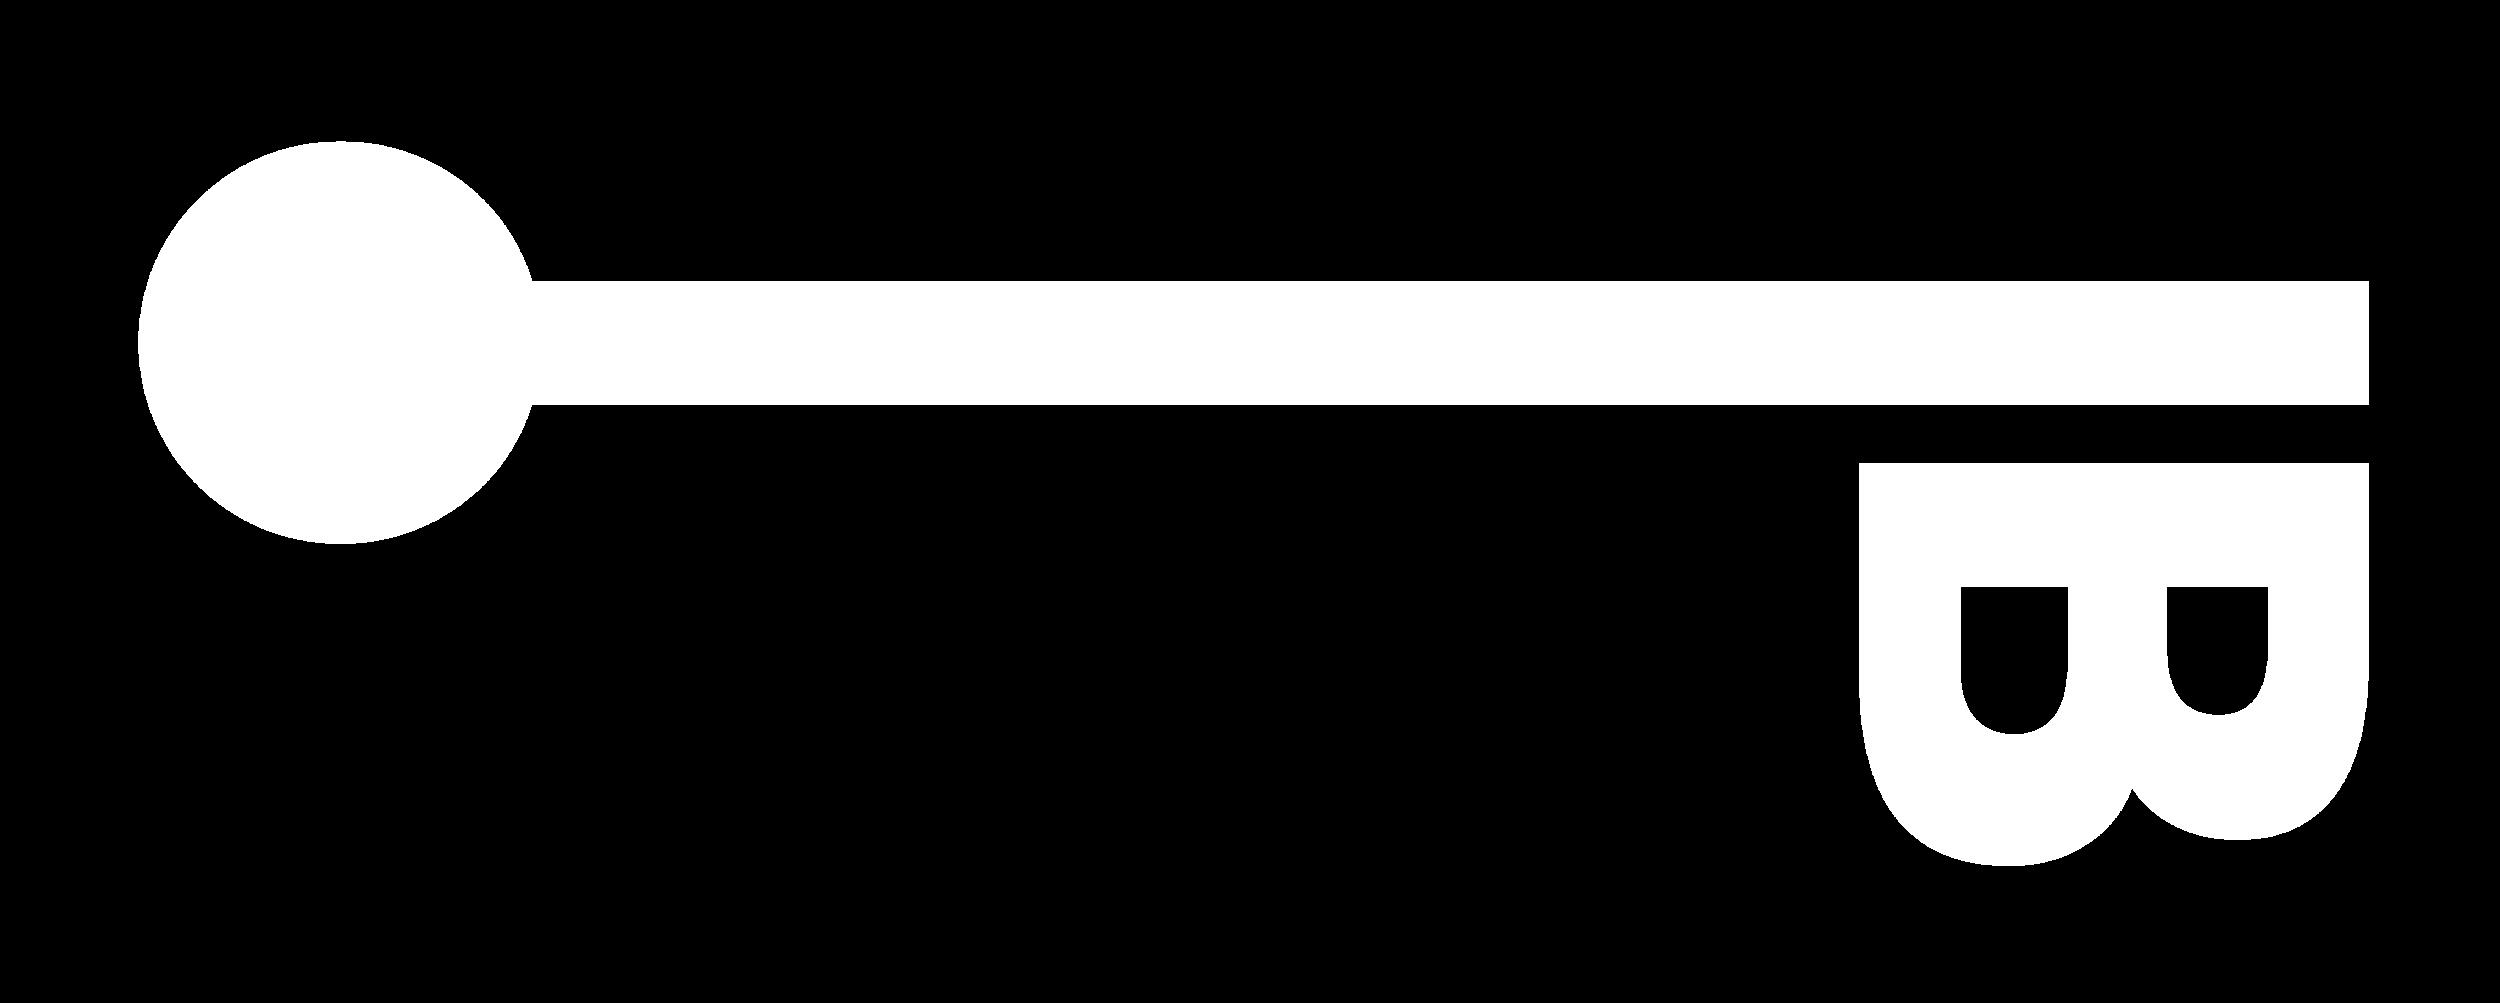 Hostel-Logosimple-Blanco@25x.png